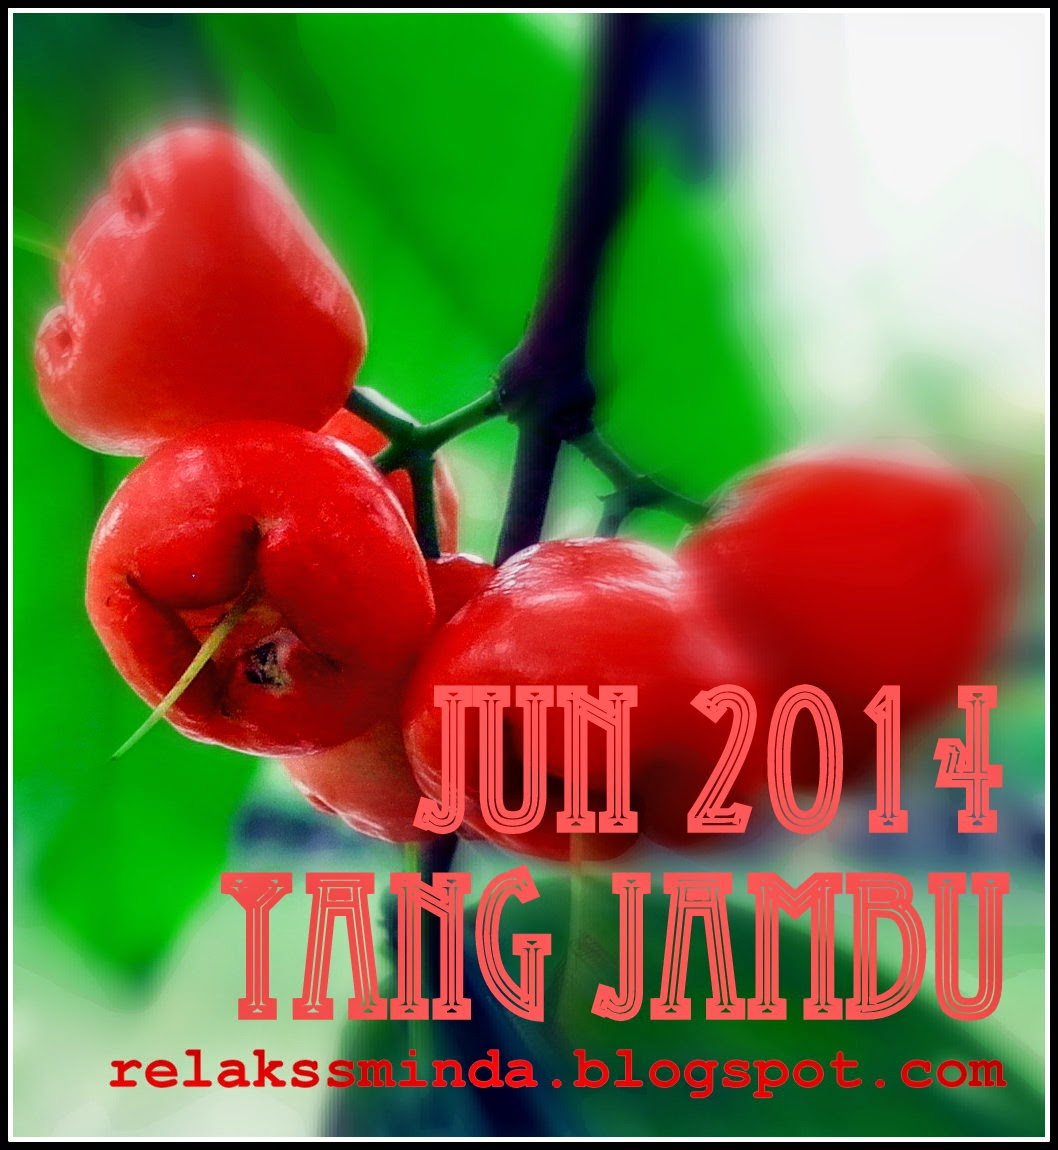 Prestasi Blog Jun 2014